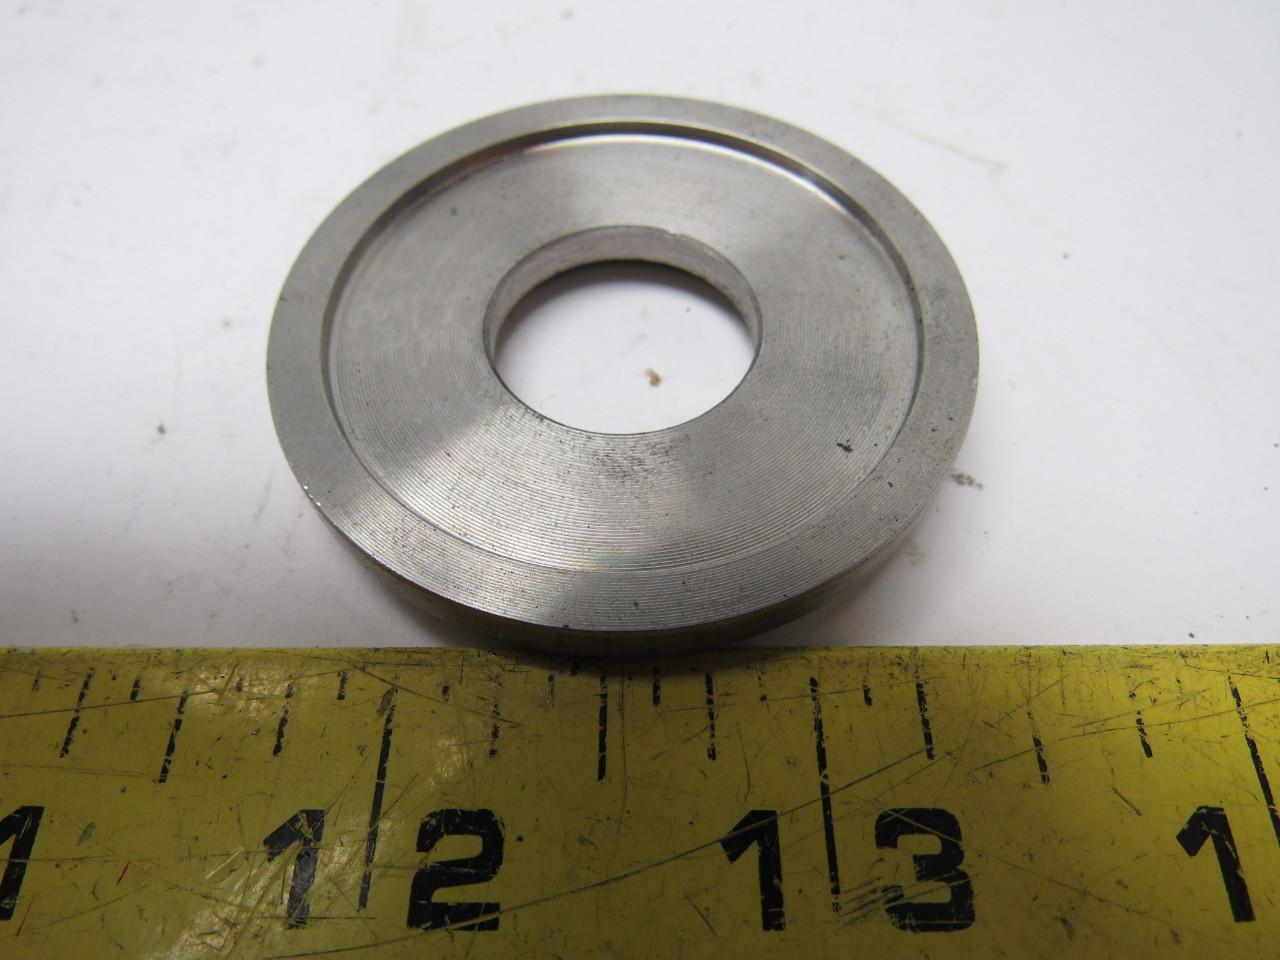 Crane Deming 0080305 3 4 Id 2 Od Impeller Washer Pump